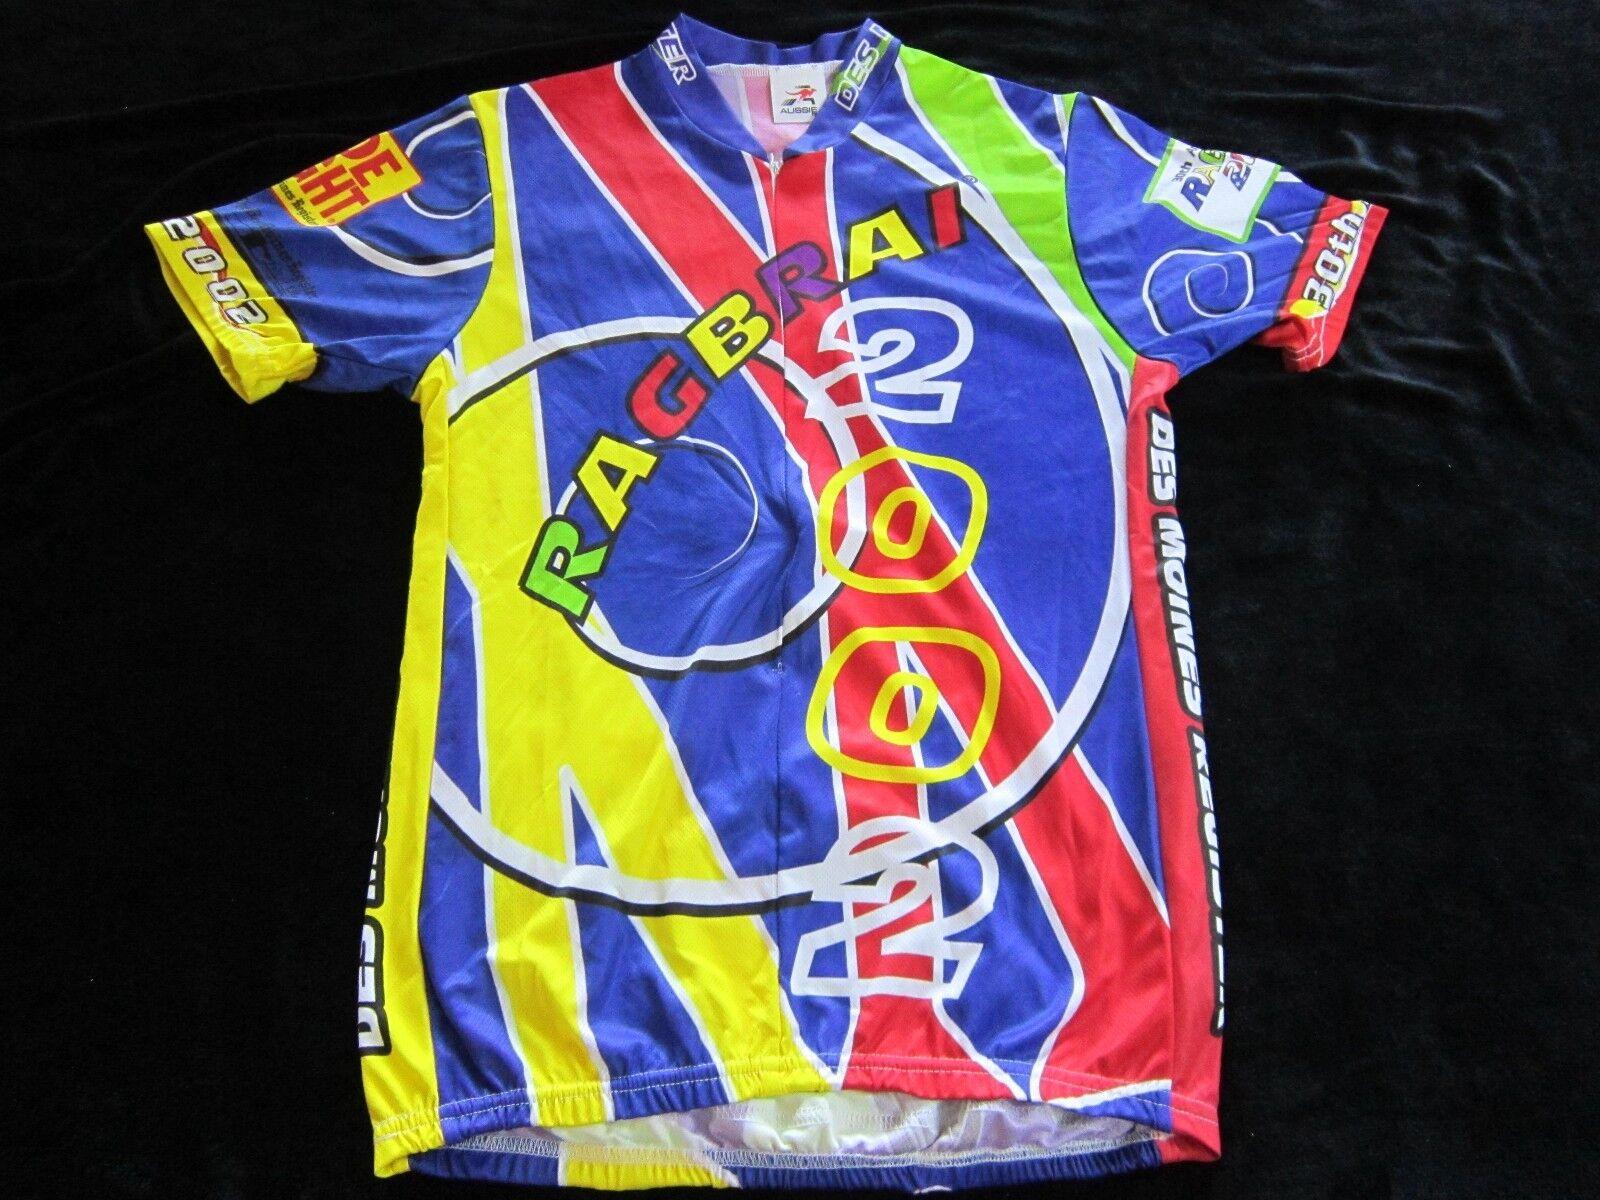 Ragbrai Bicicletas Jersey 2002 Ride adulto medio M Iowa Ciclismo 30 Des Moines